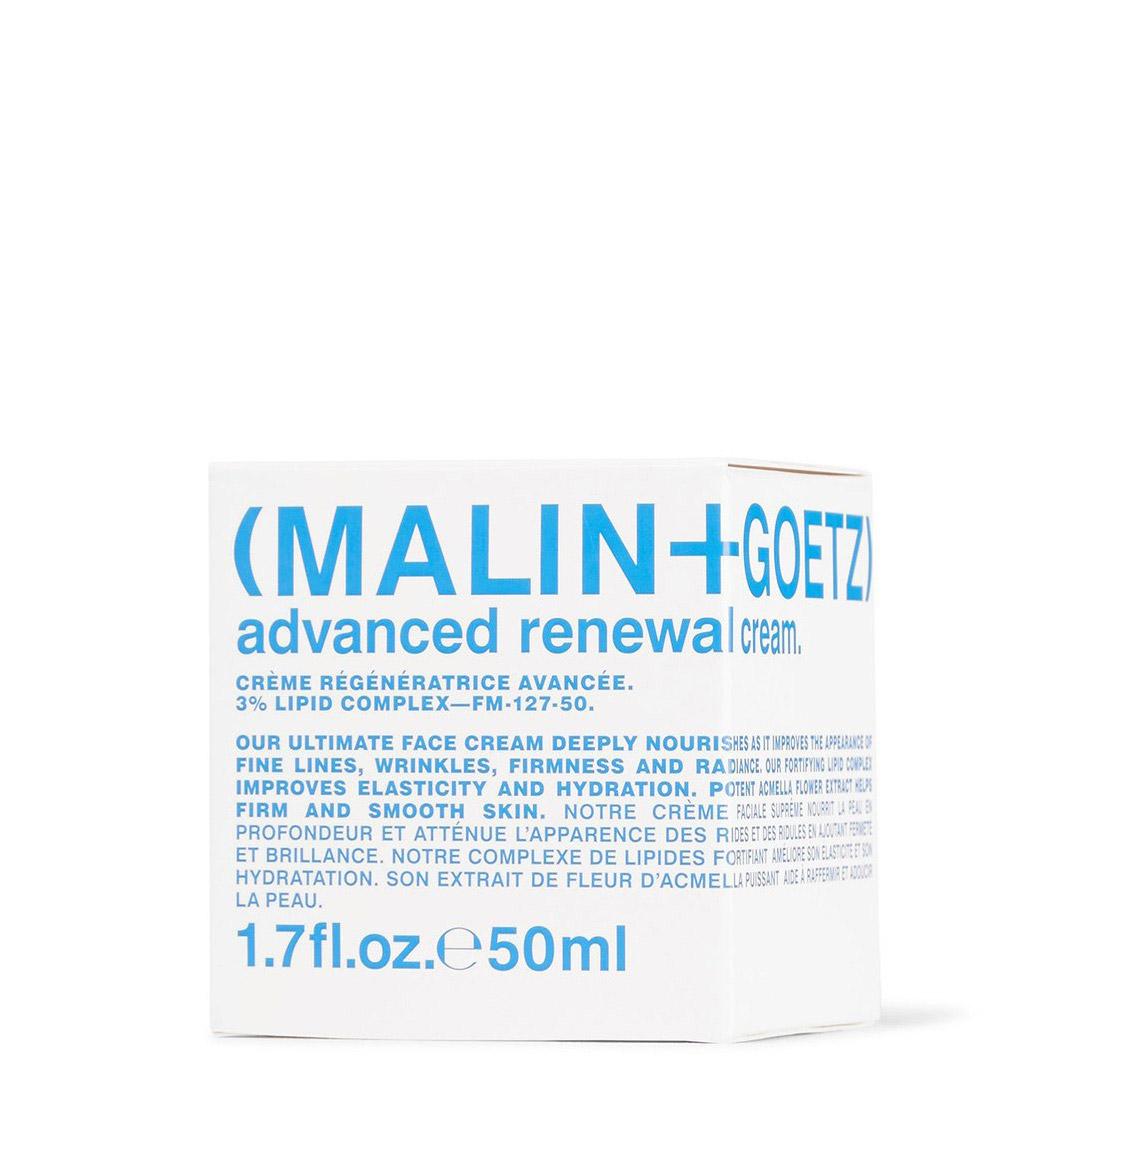 Malin and Goetz Advanced Renewal Cream